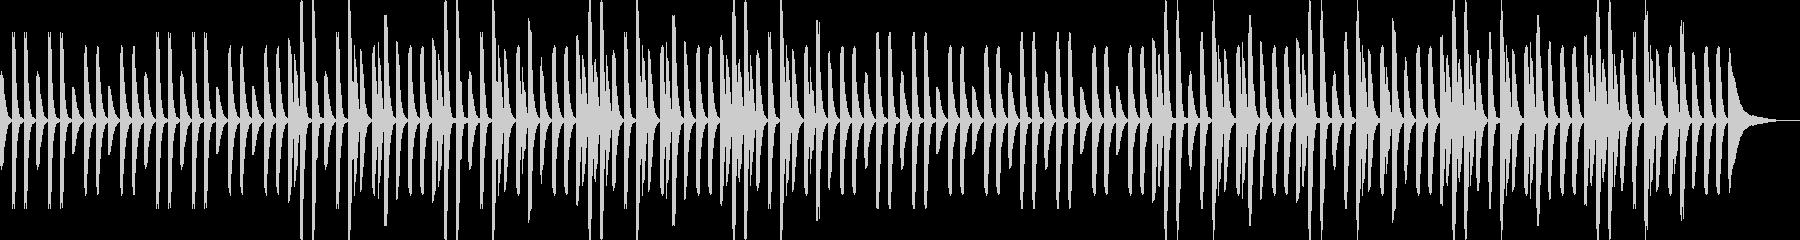 YouTube・奇妙・日常・ピアノソロの未再生の波形